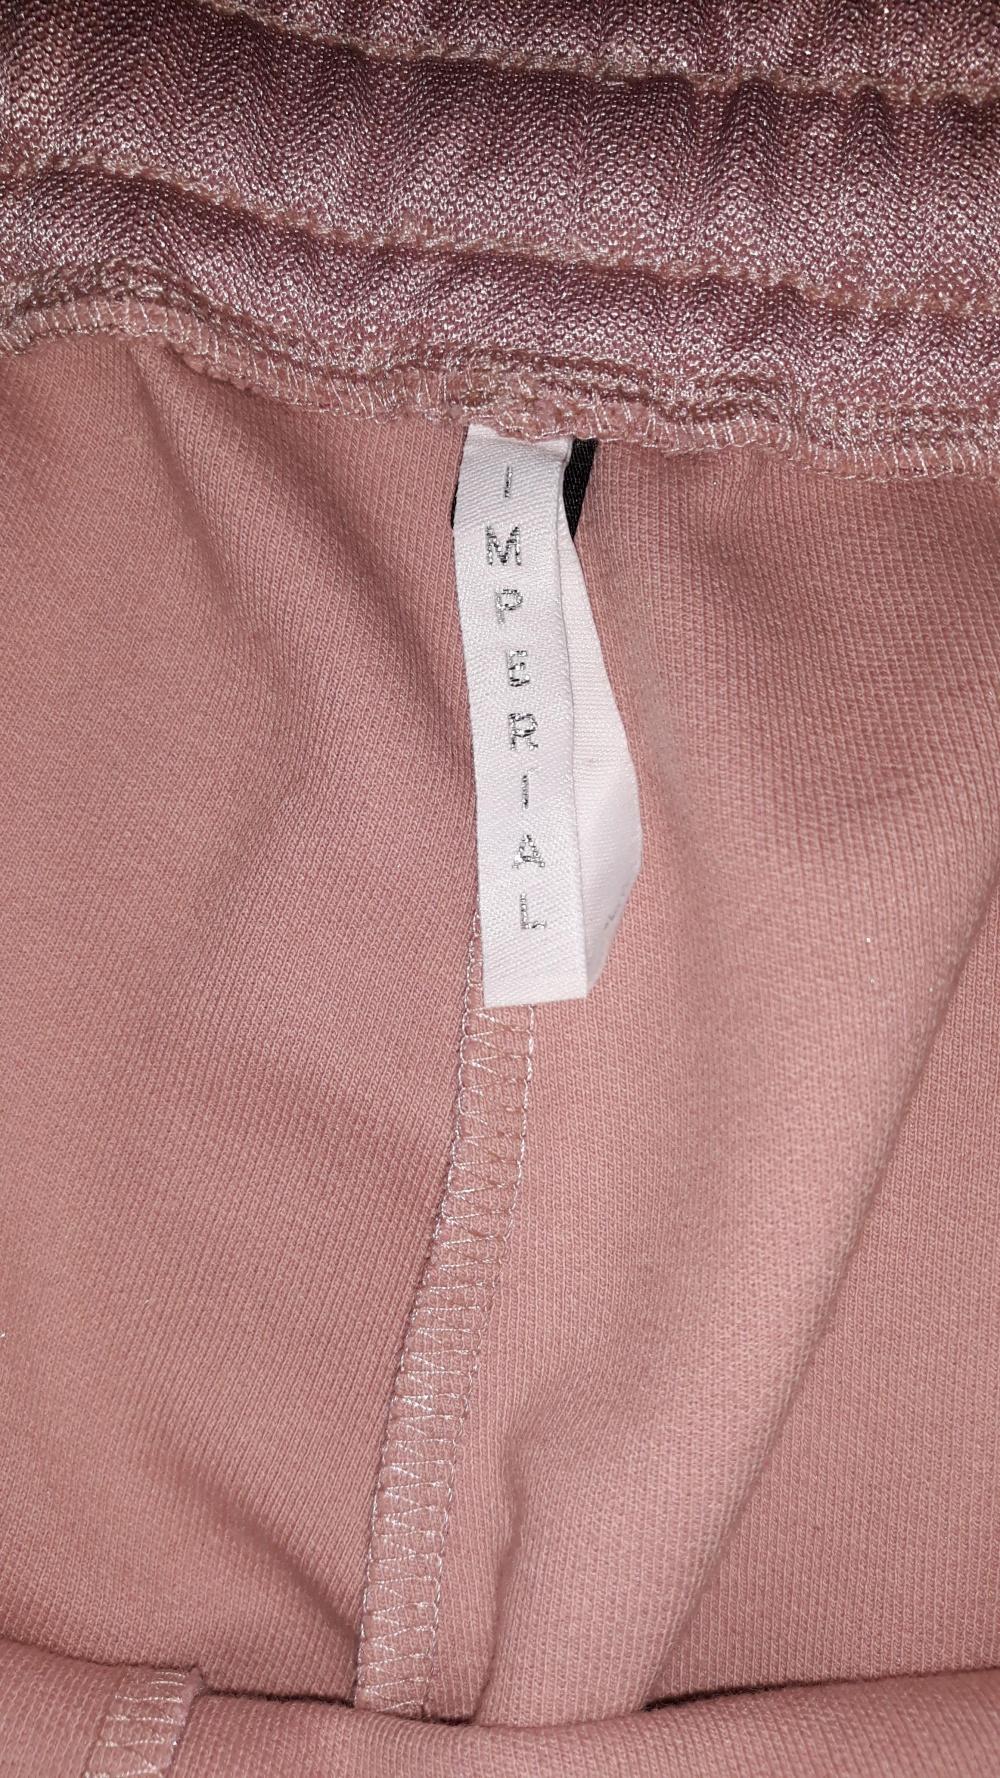 Итальянский брюки Imperial, раз.М.